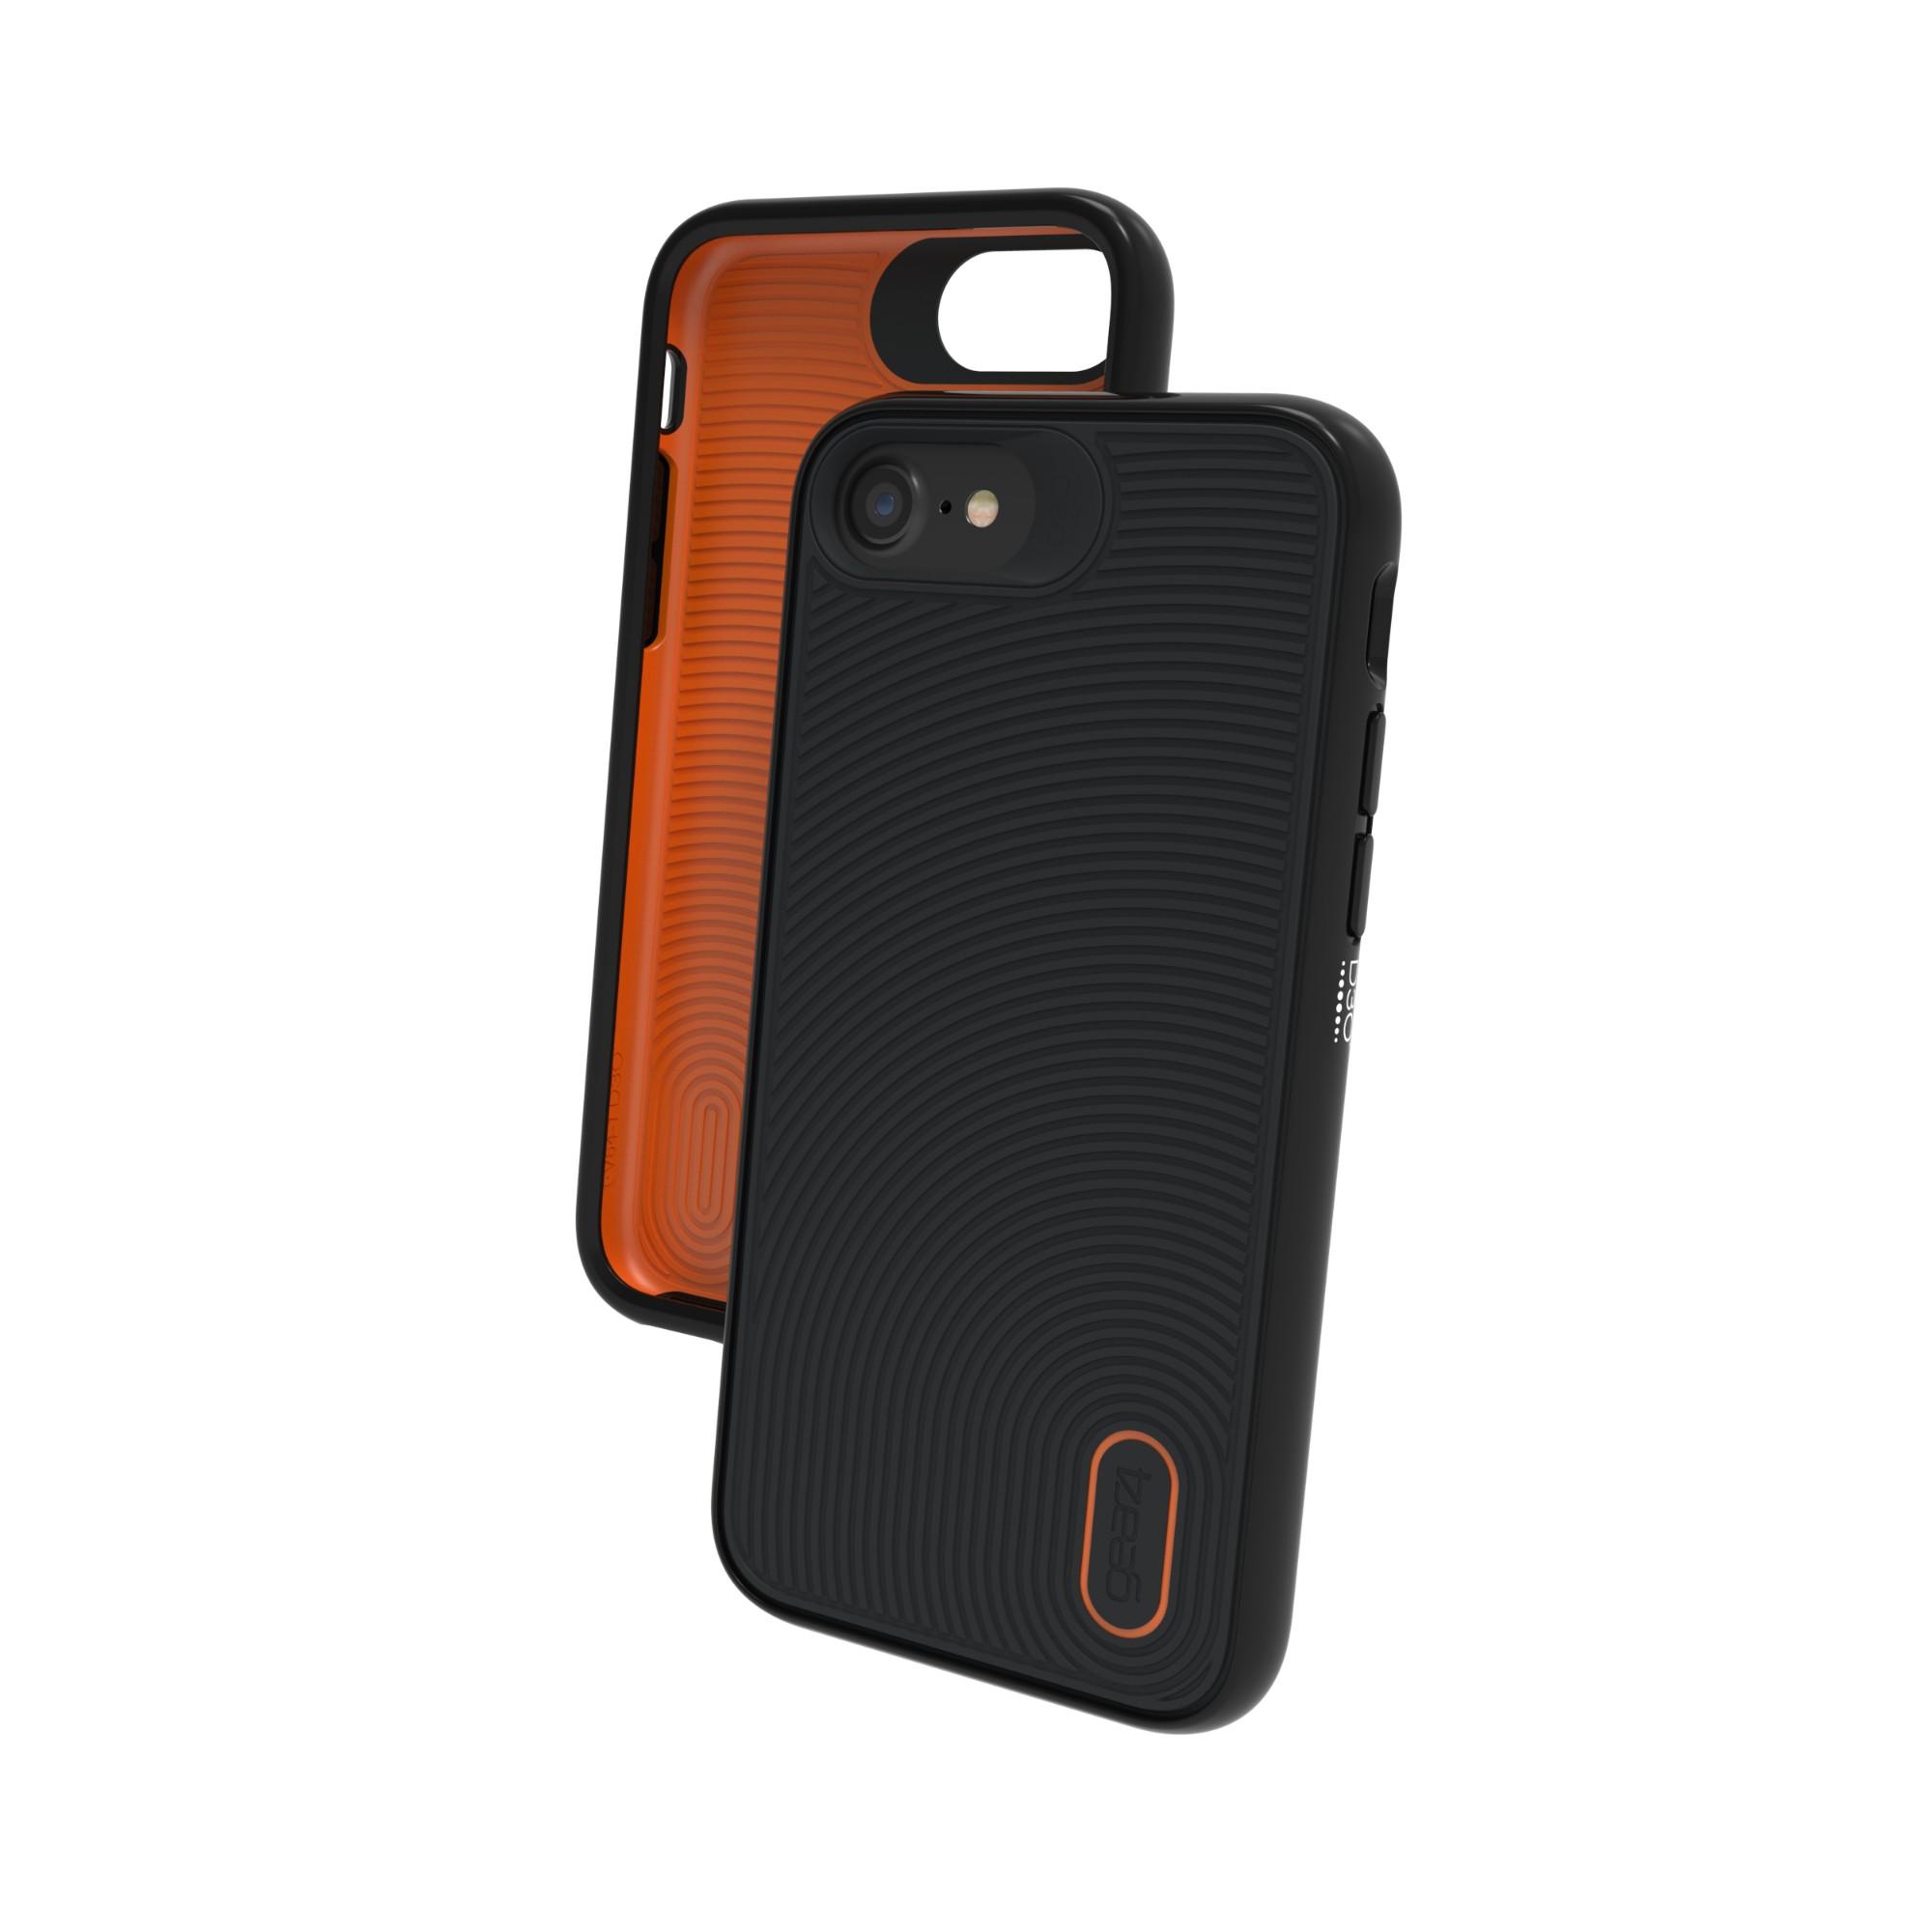 "GEAR4 Battersea funda para teléfono móvil 11,9 cm (4.7"") Negro, Naranja"